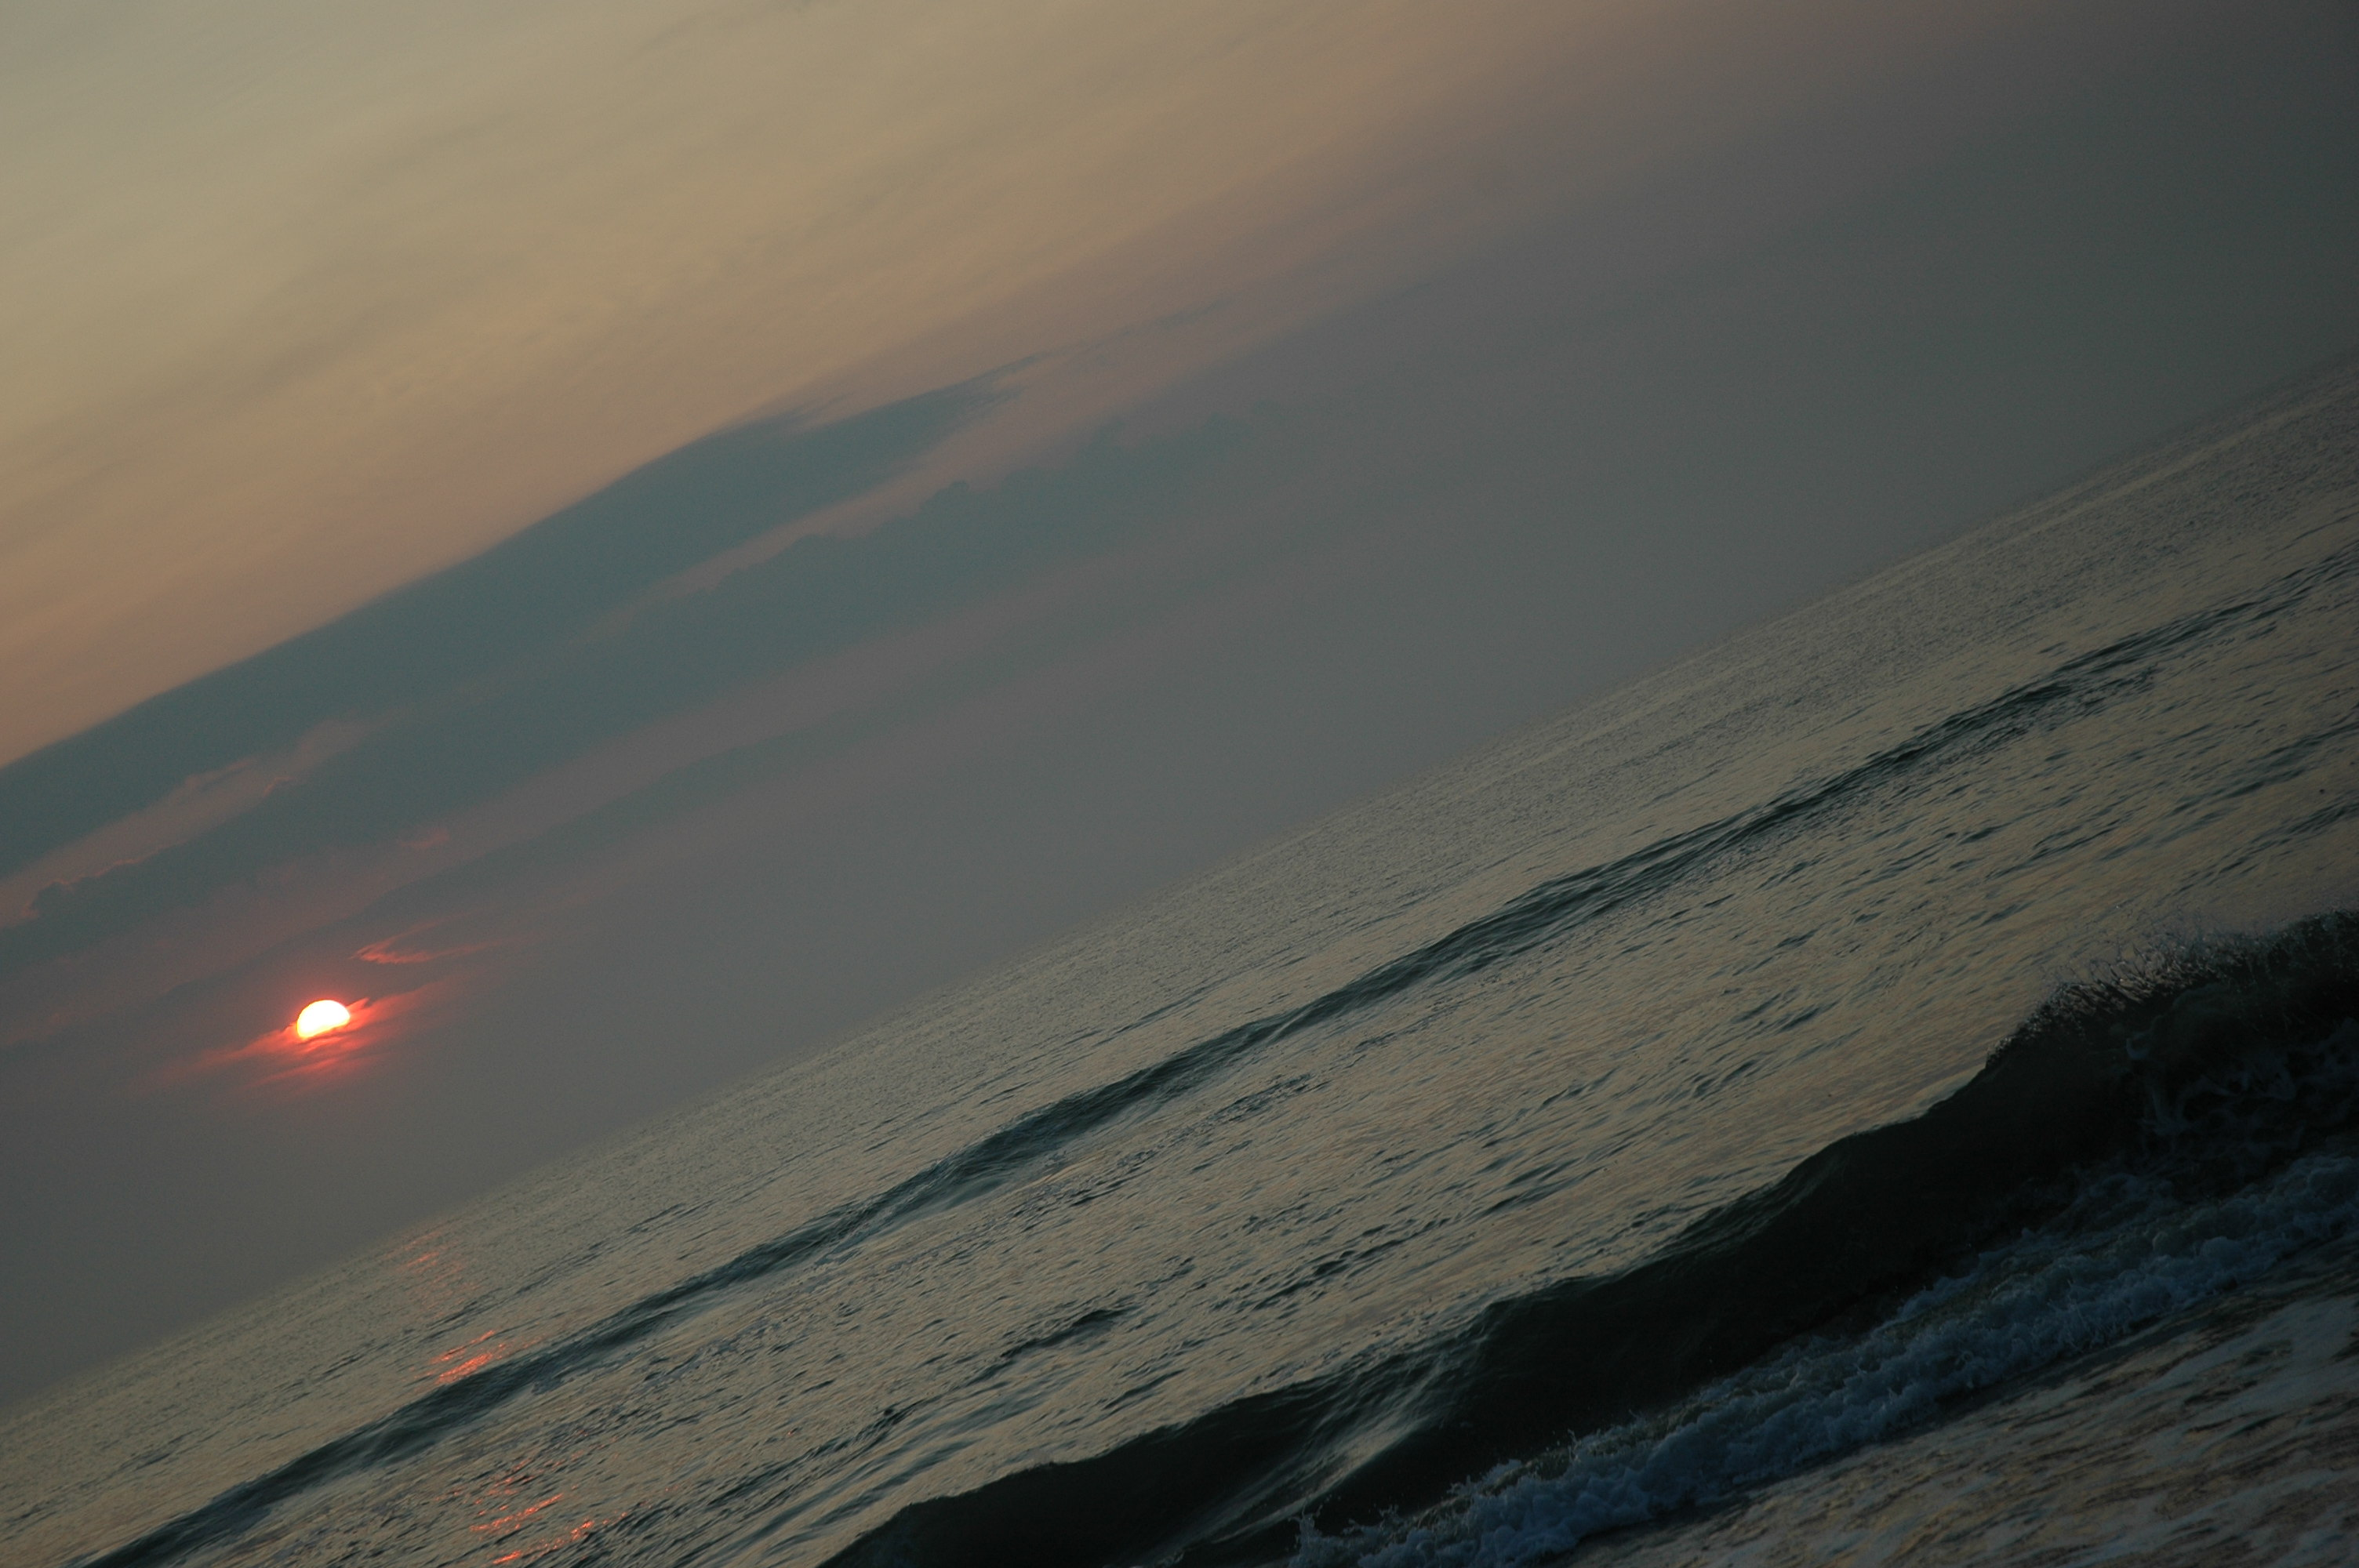 07_14_09-16